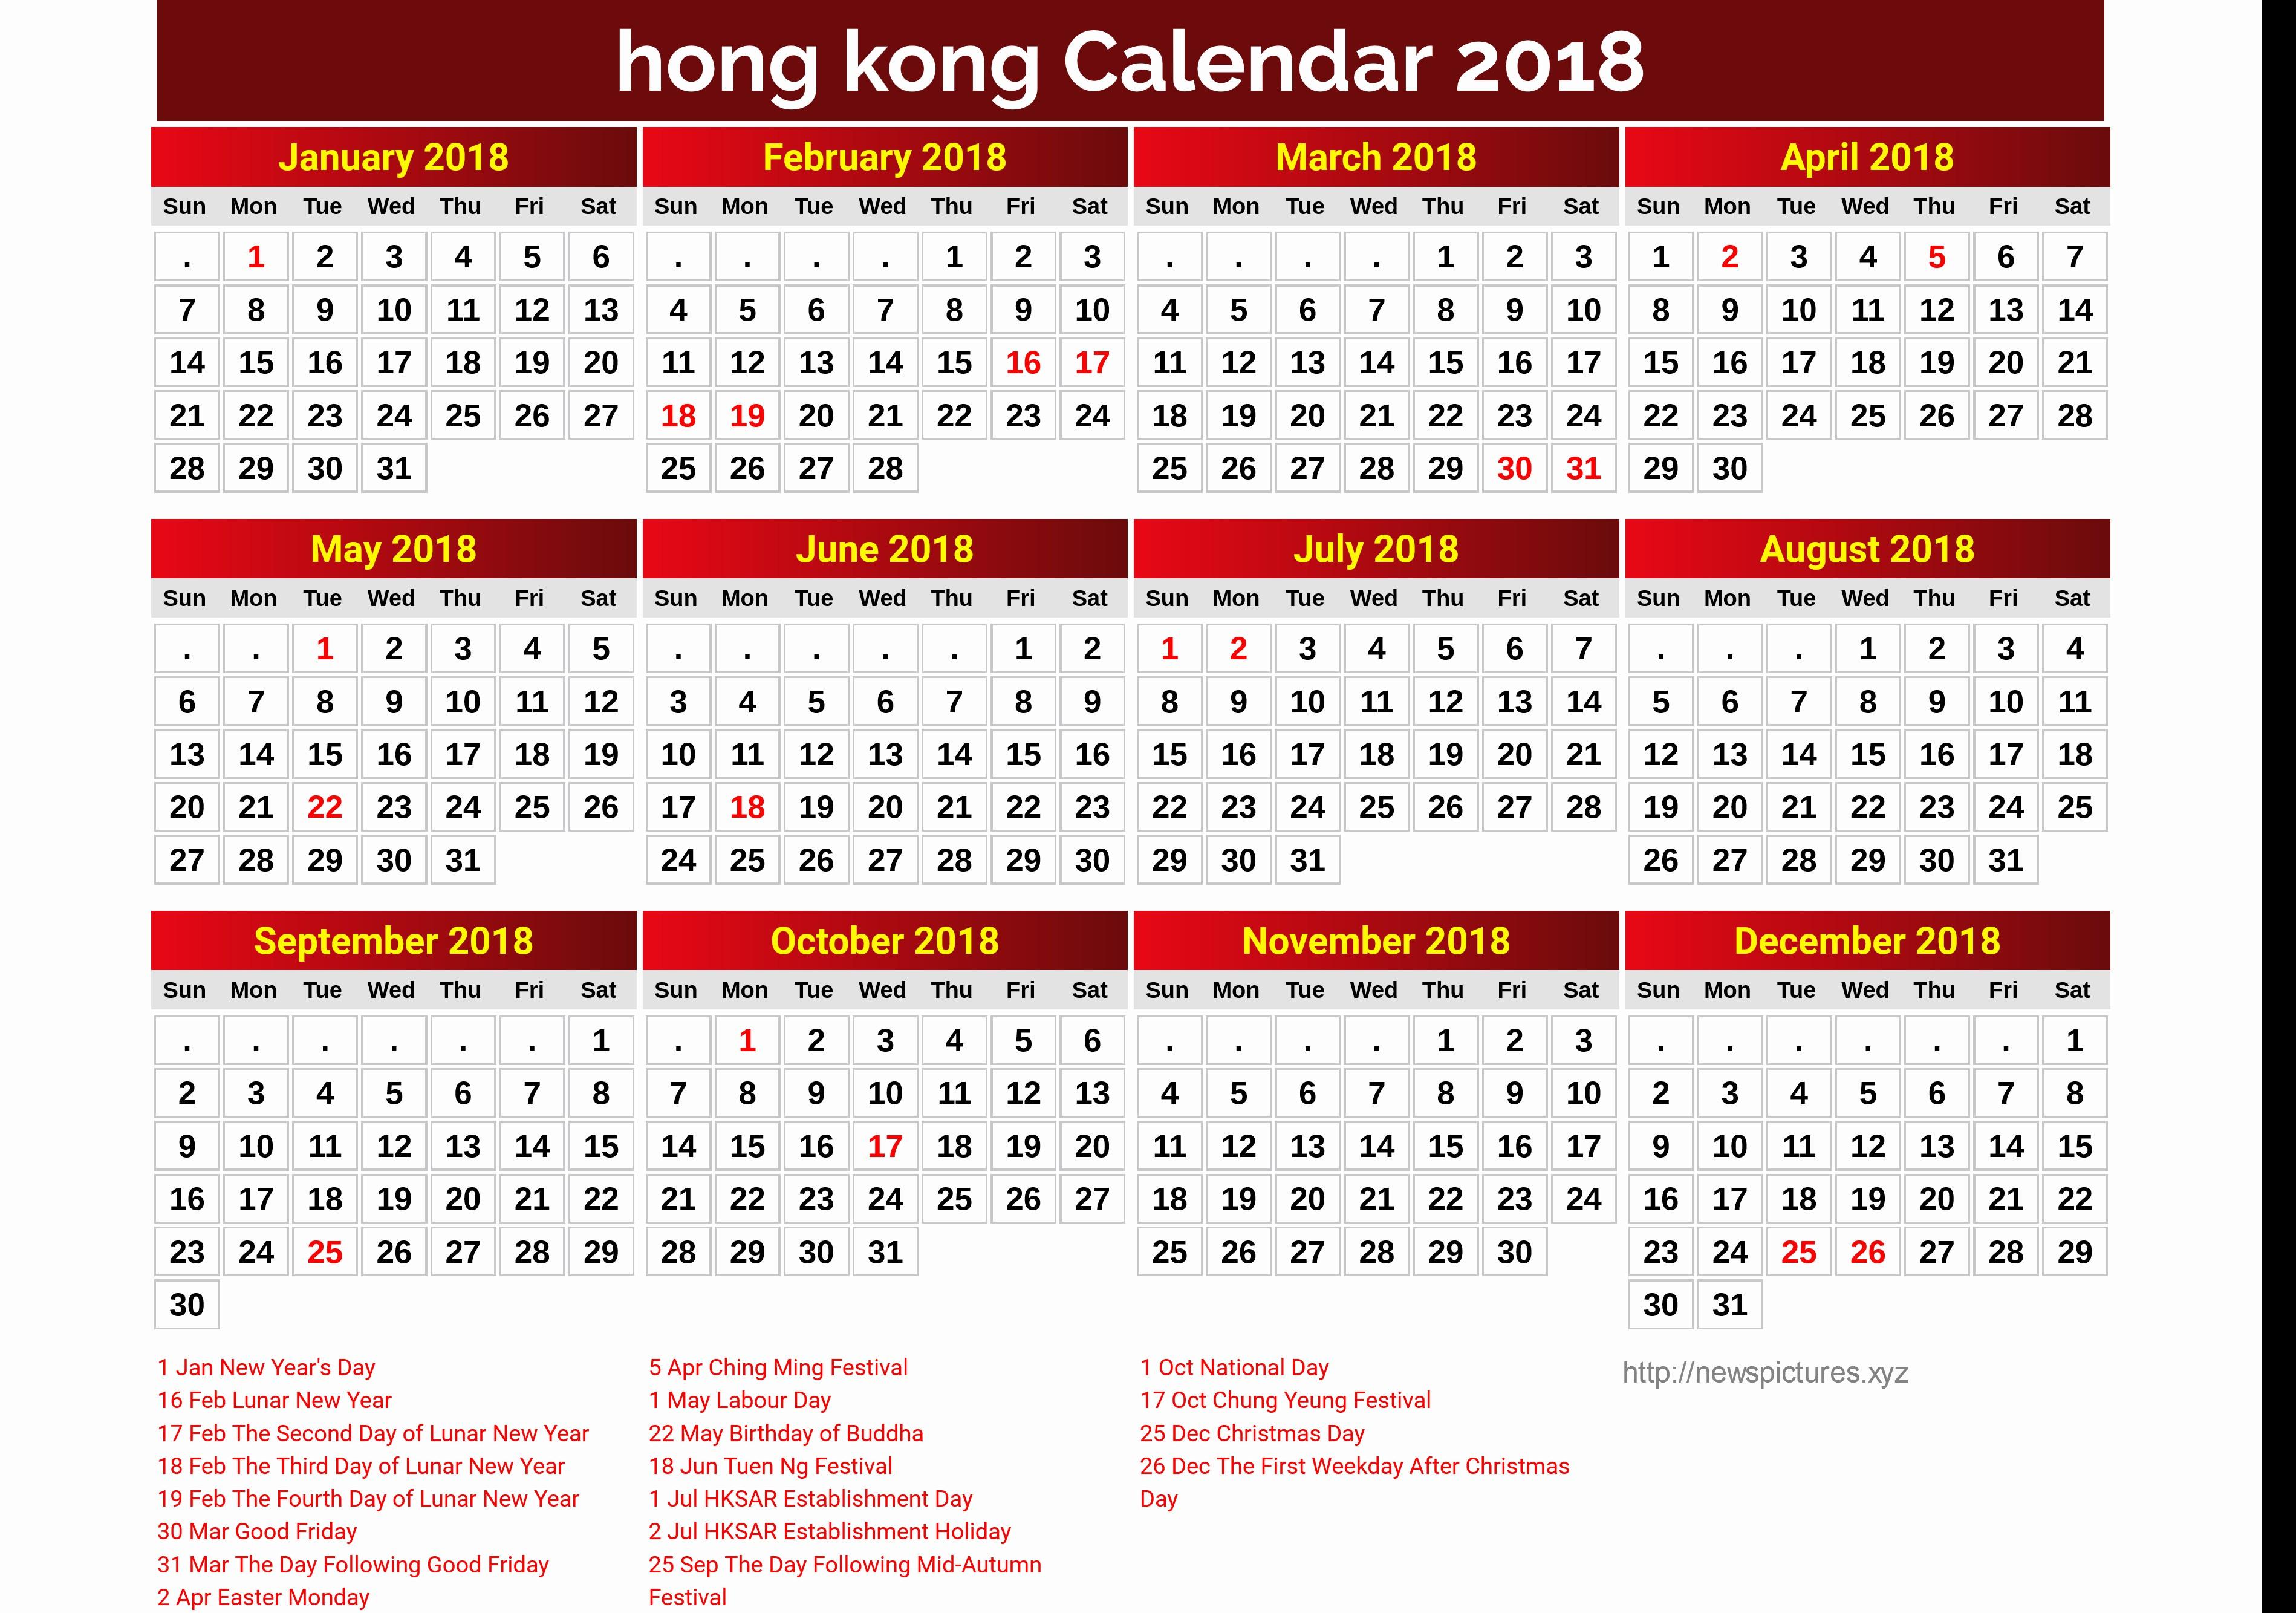 2019 calendar hong kong hong kong holidays 2018 nasionalis 2018 calendar hong kong 2018 calendar printable